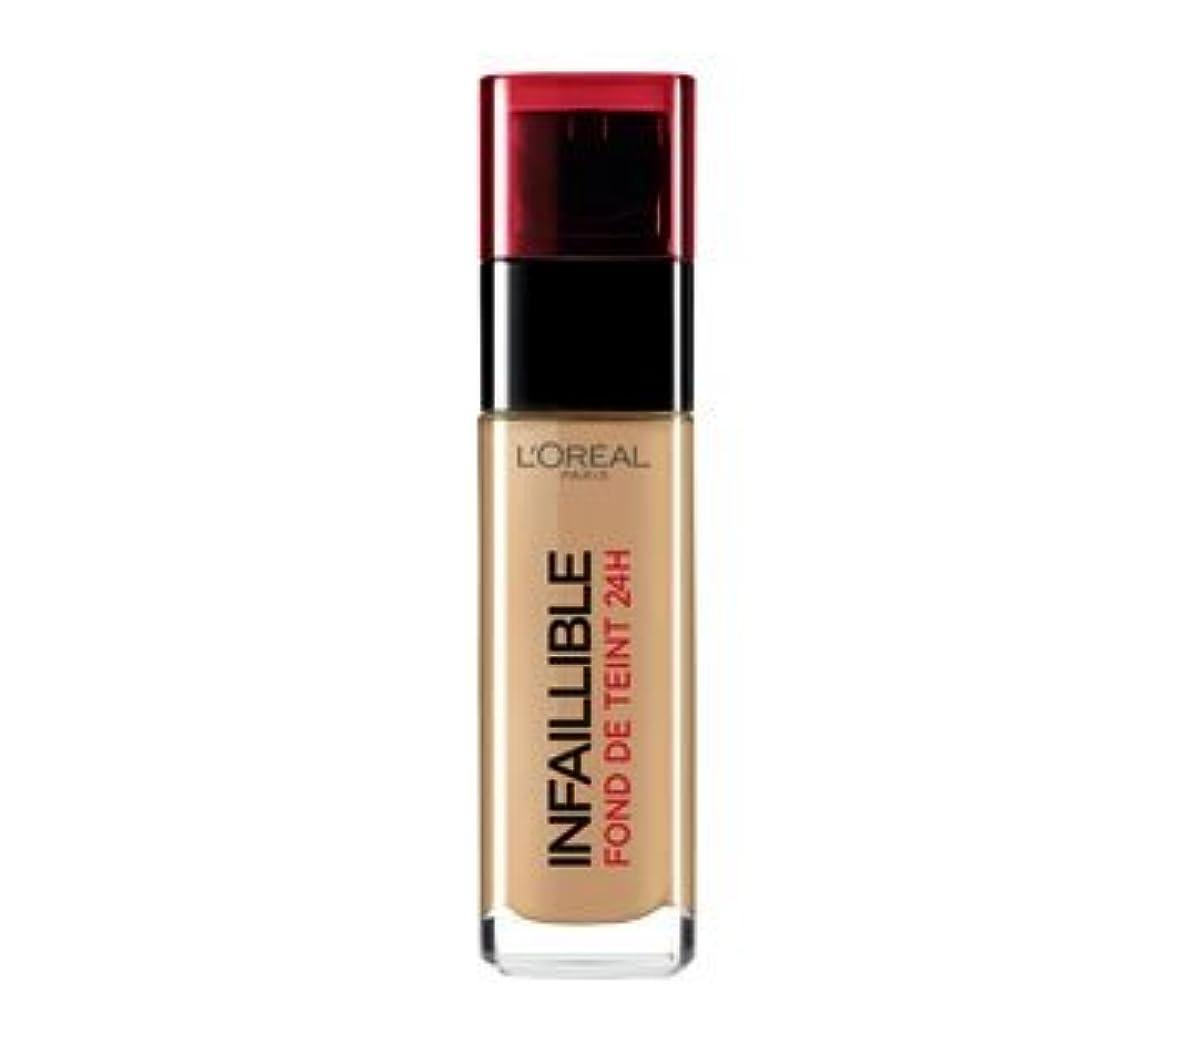 切手レディ路地L 'Oréal Paris - Infaillible 24h 300 Ambre - Grundierung